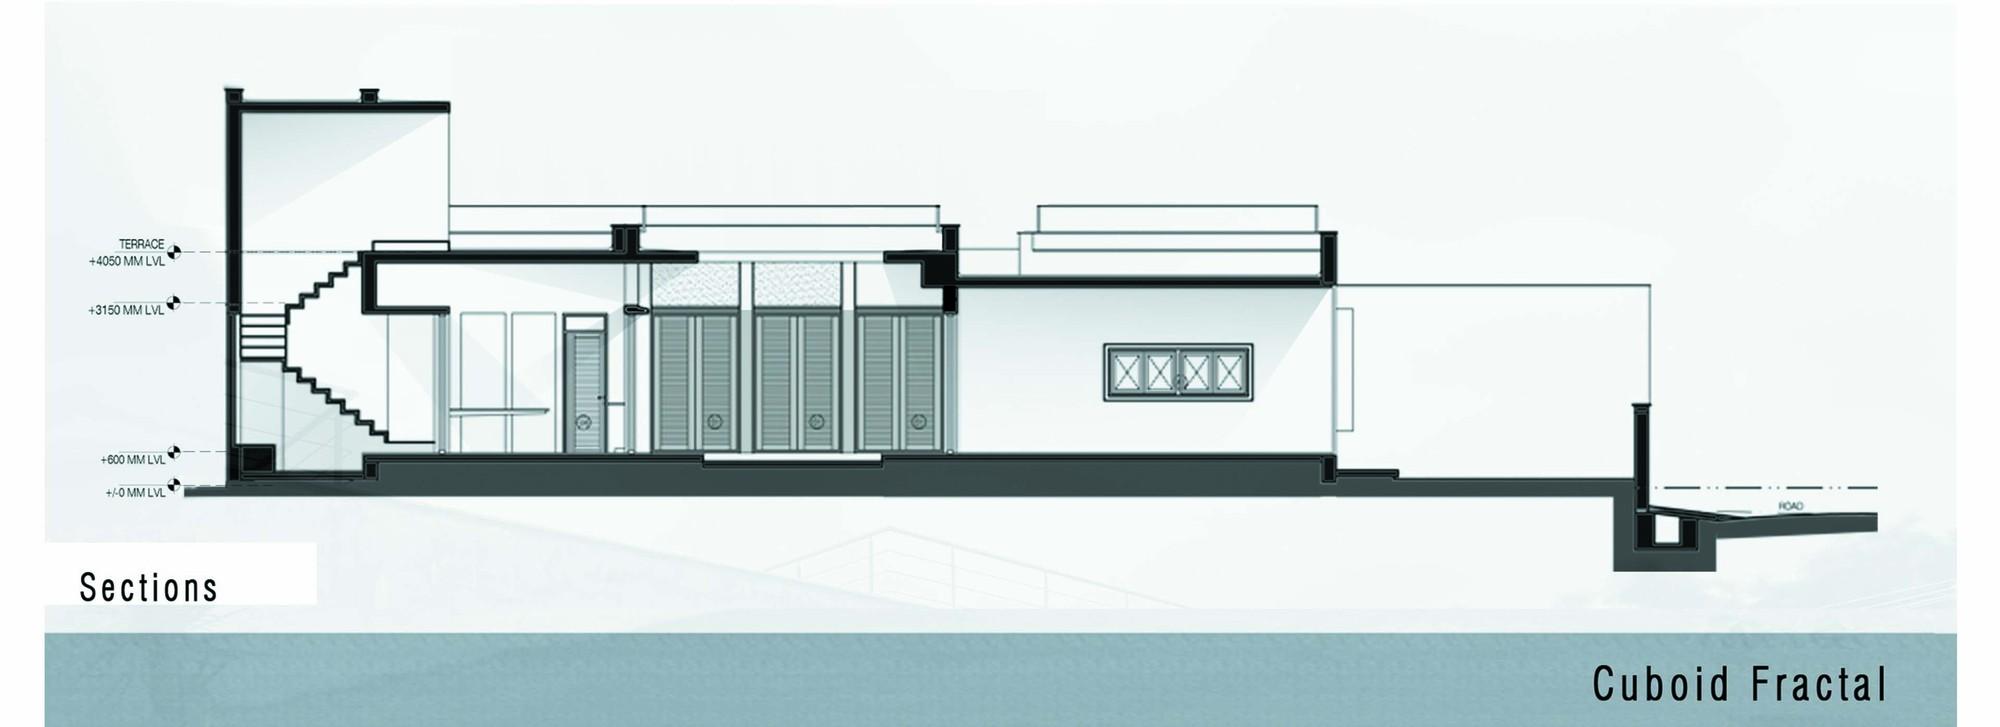 Gallery Of Cuboid Fractal Greyscale Design Studio 12